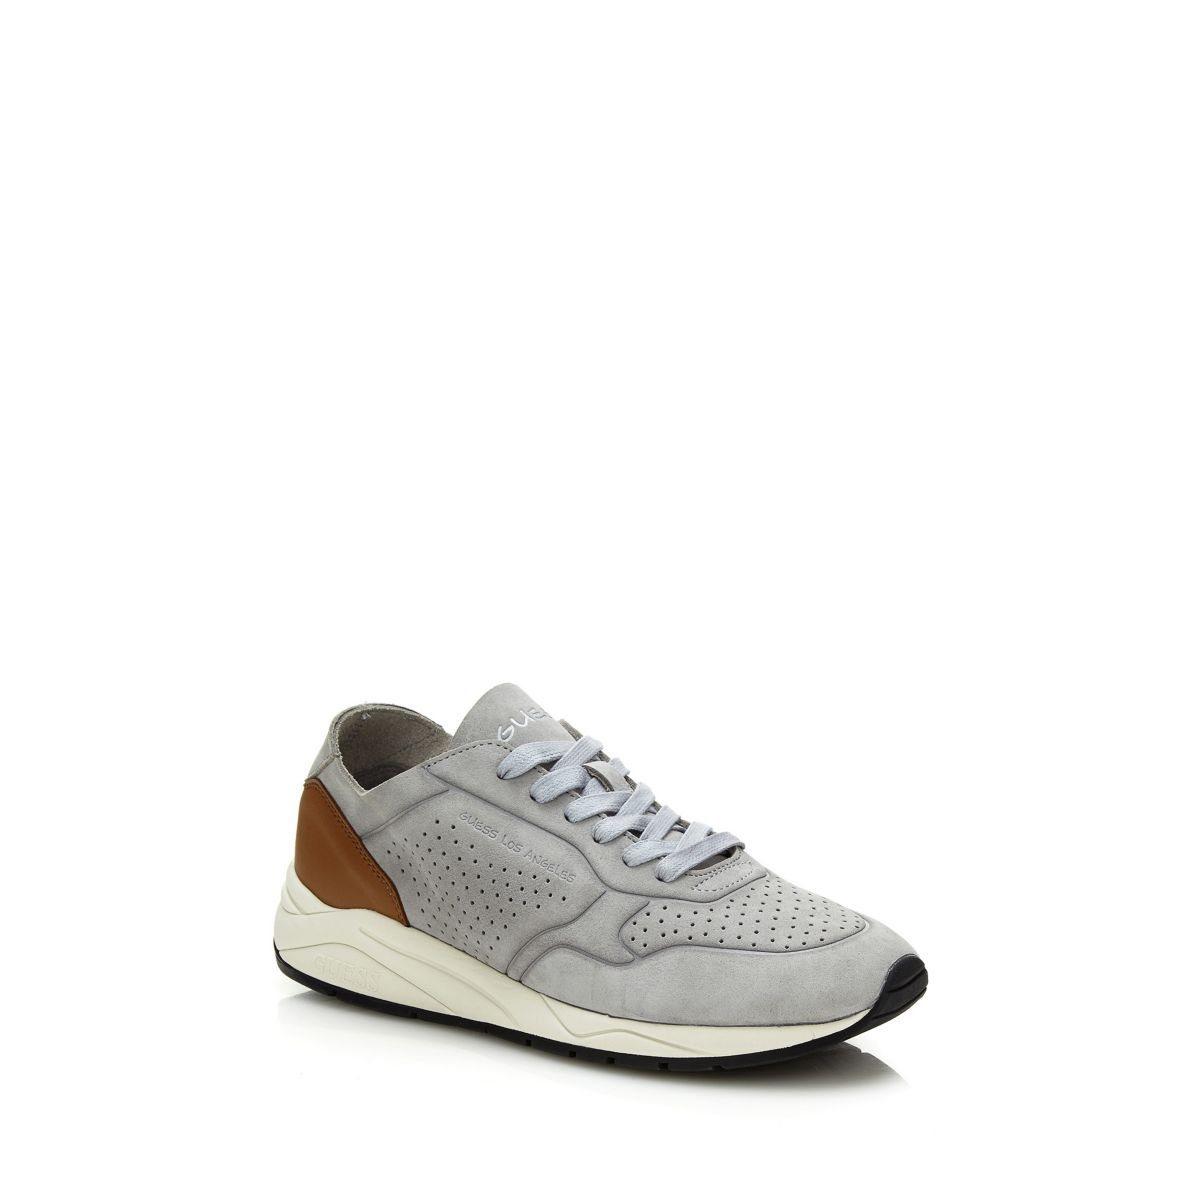 Guess Sneaker online kaufen  grau